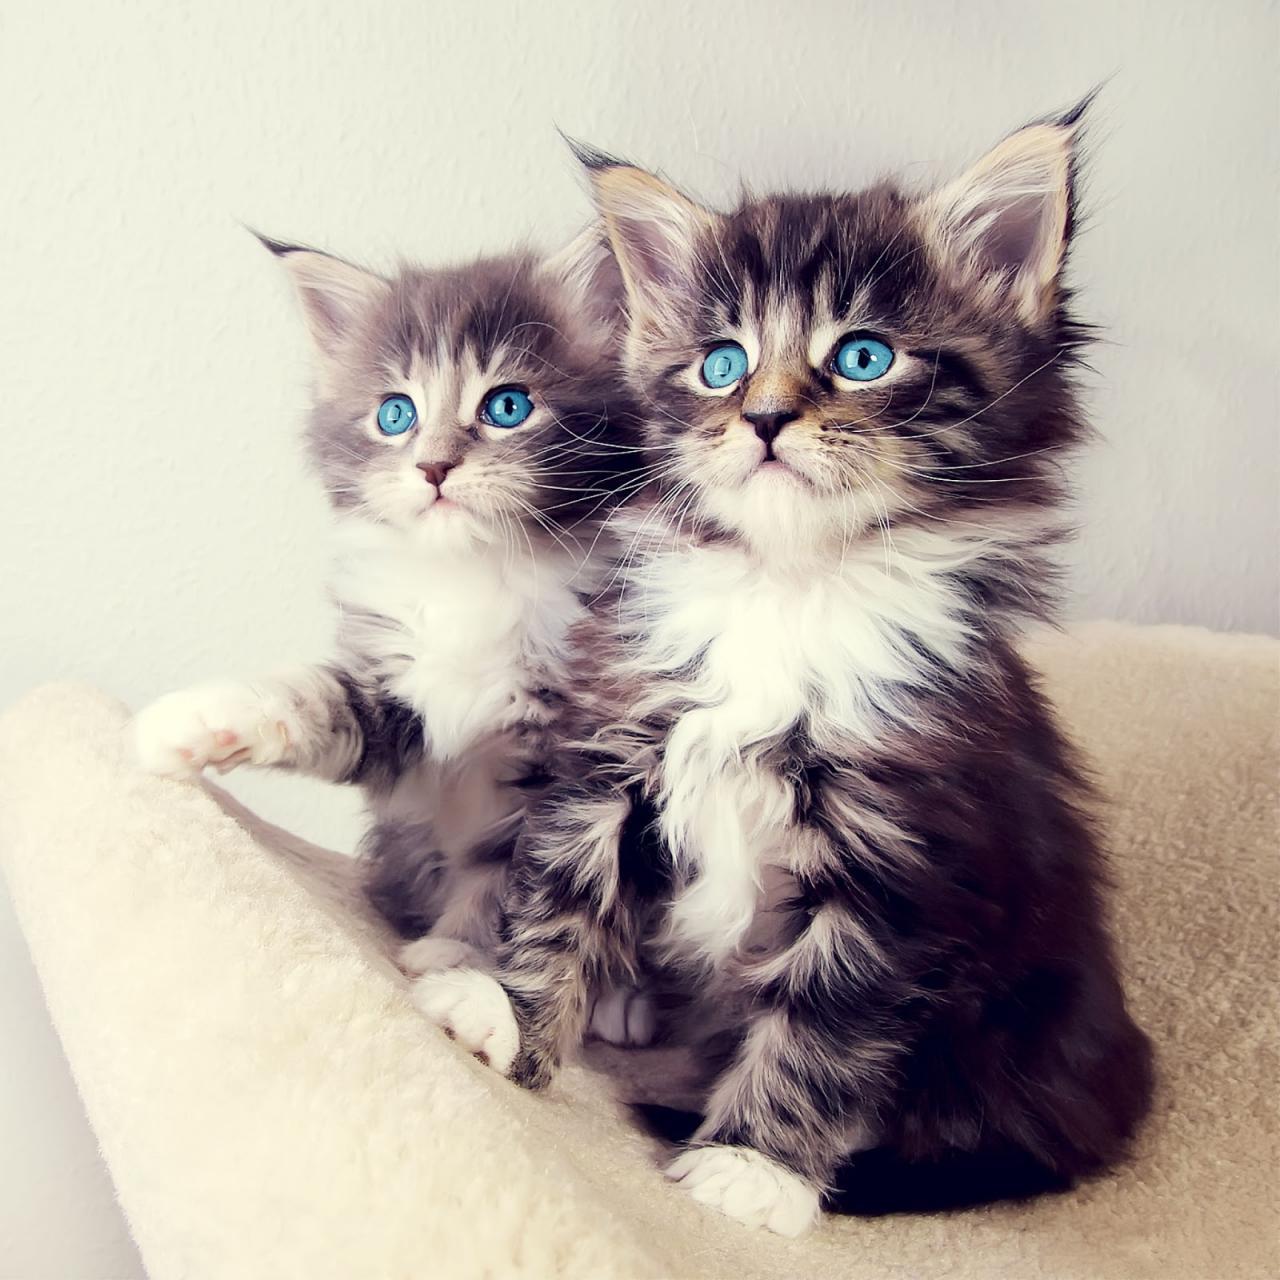 خلفيات قطط كيوت جدا 8